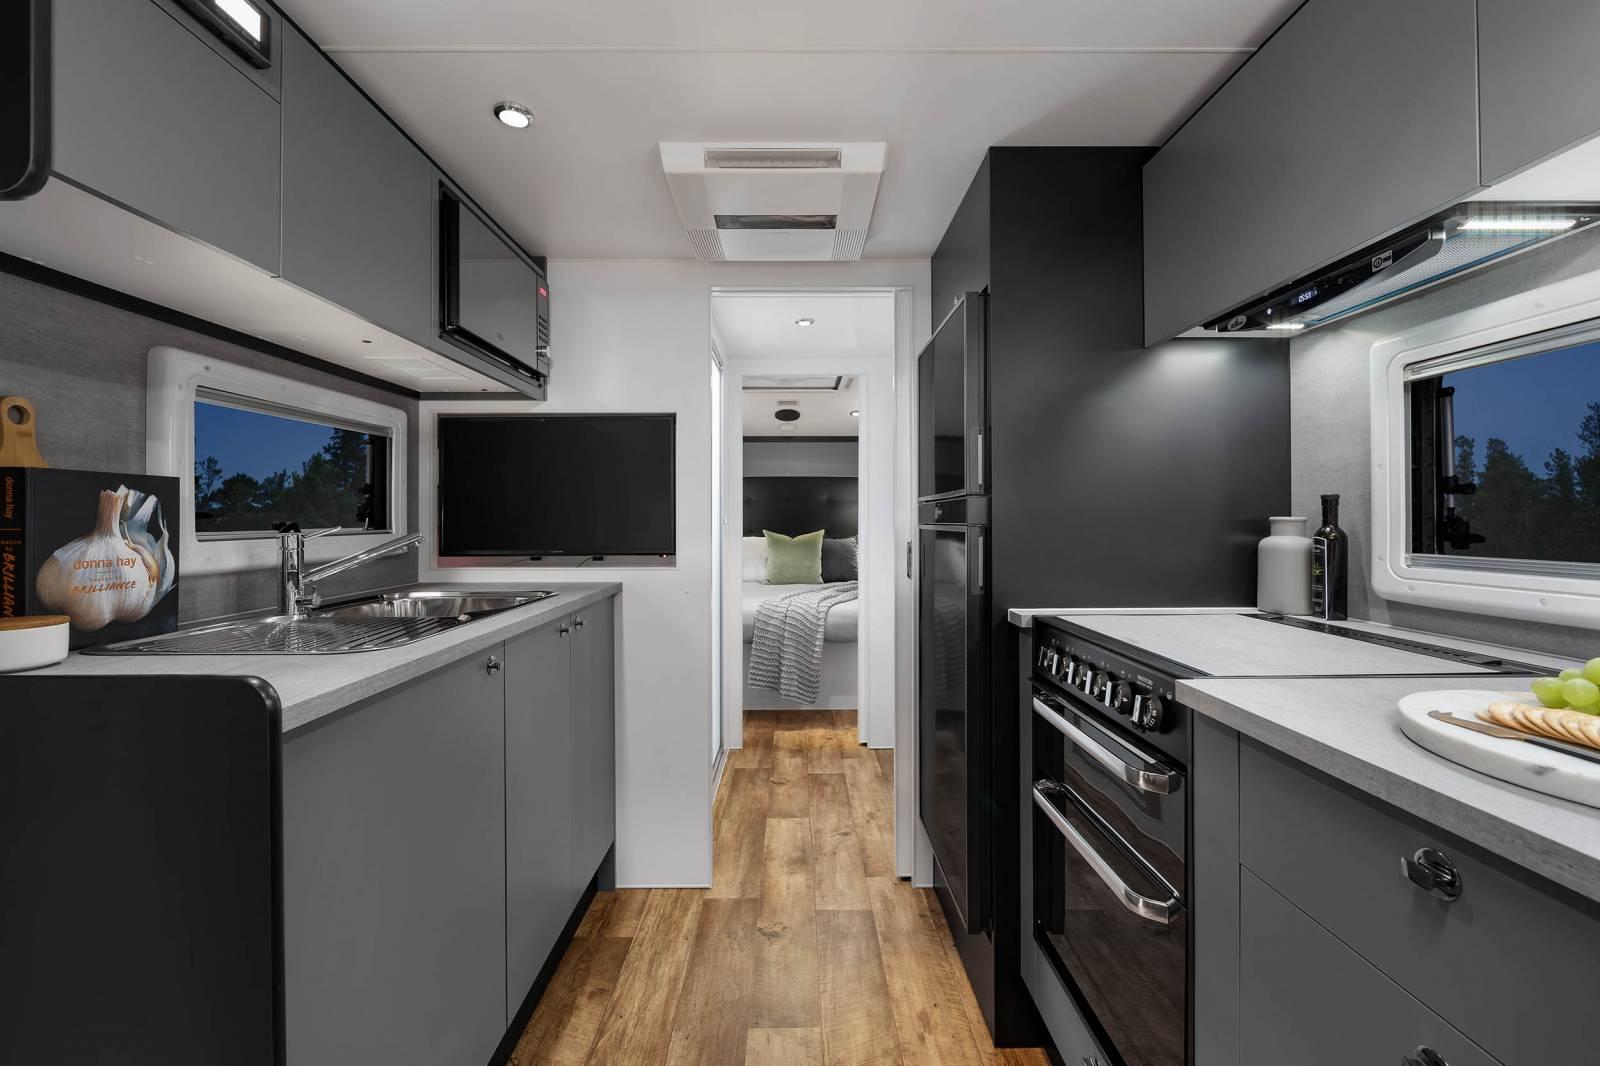 10 tips for storing your caravan